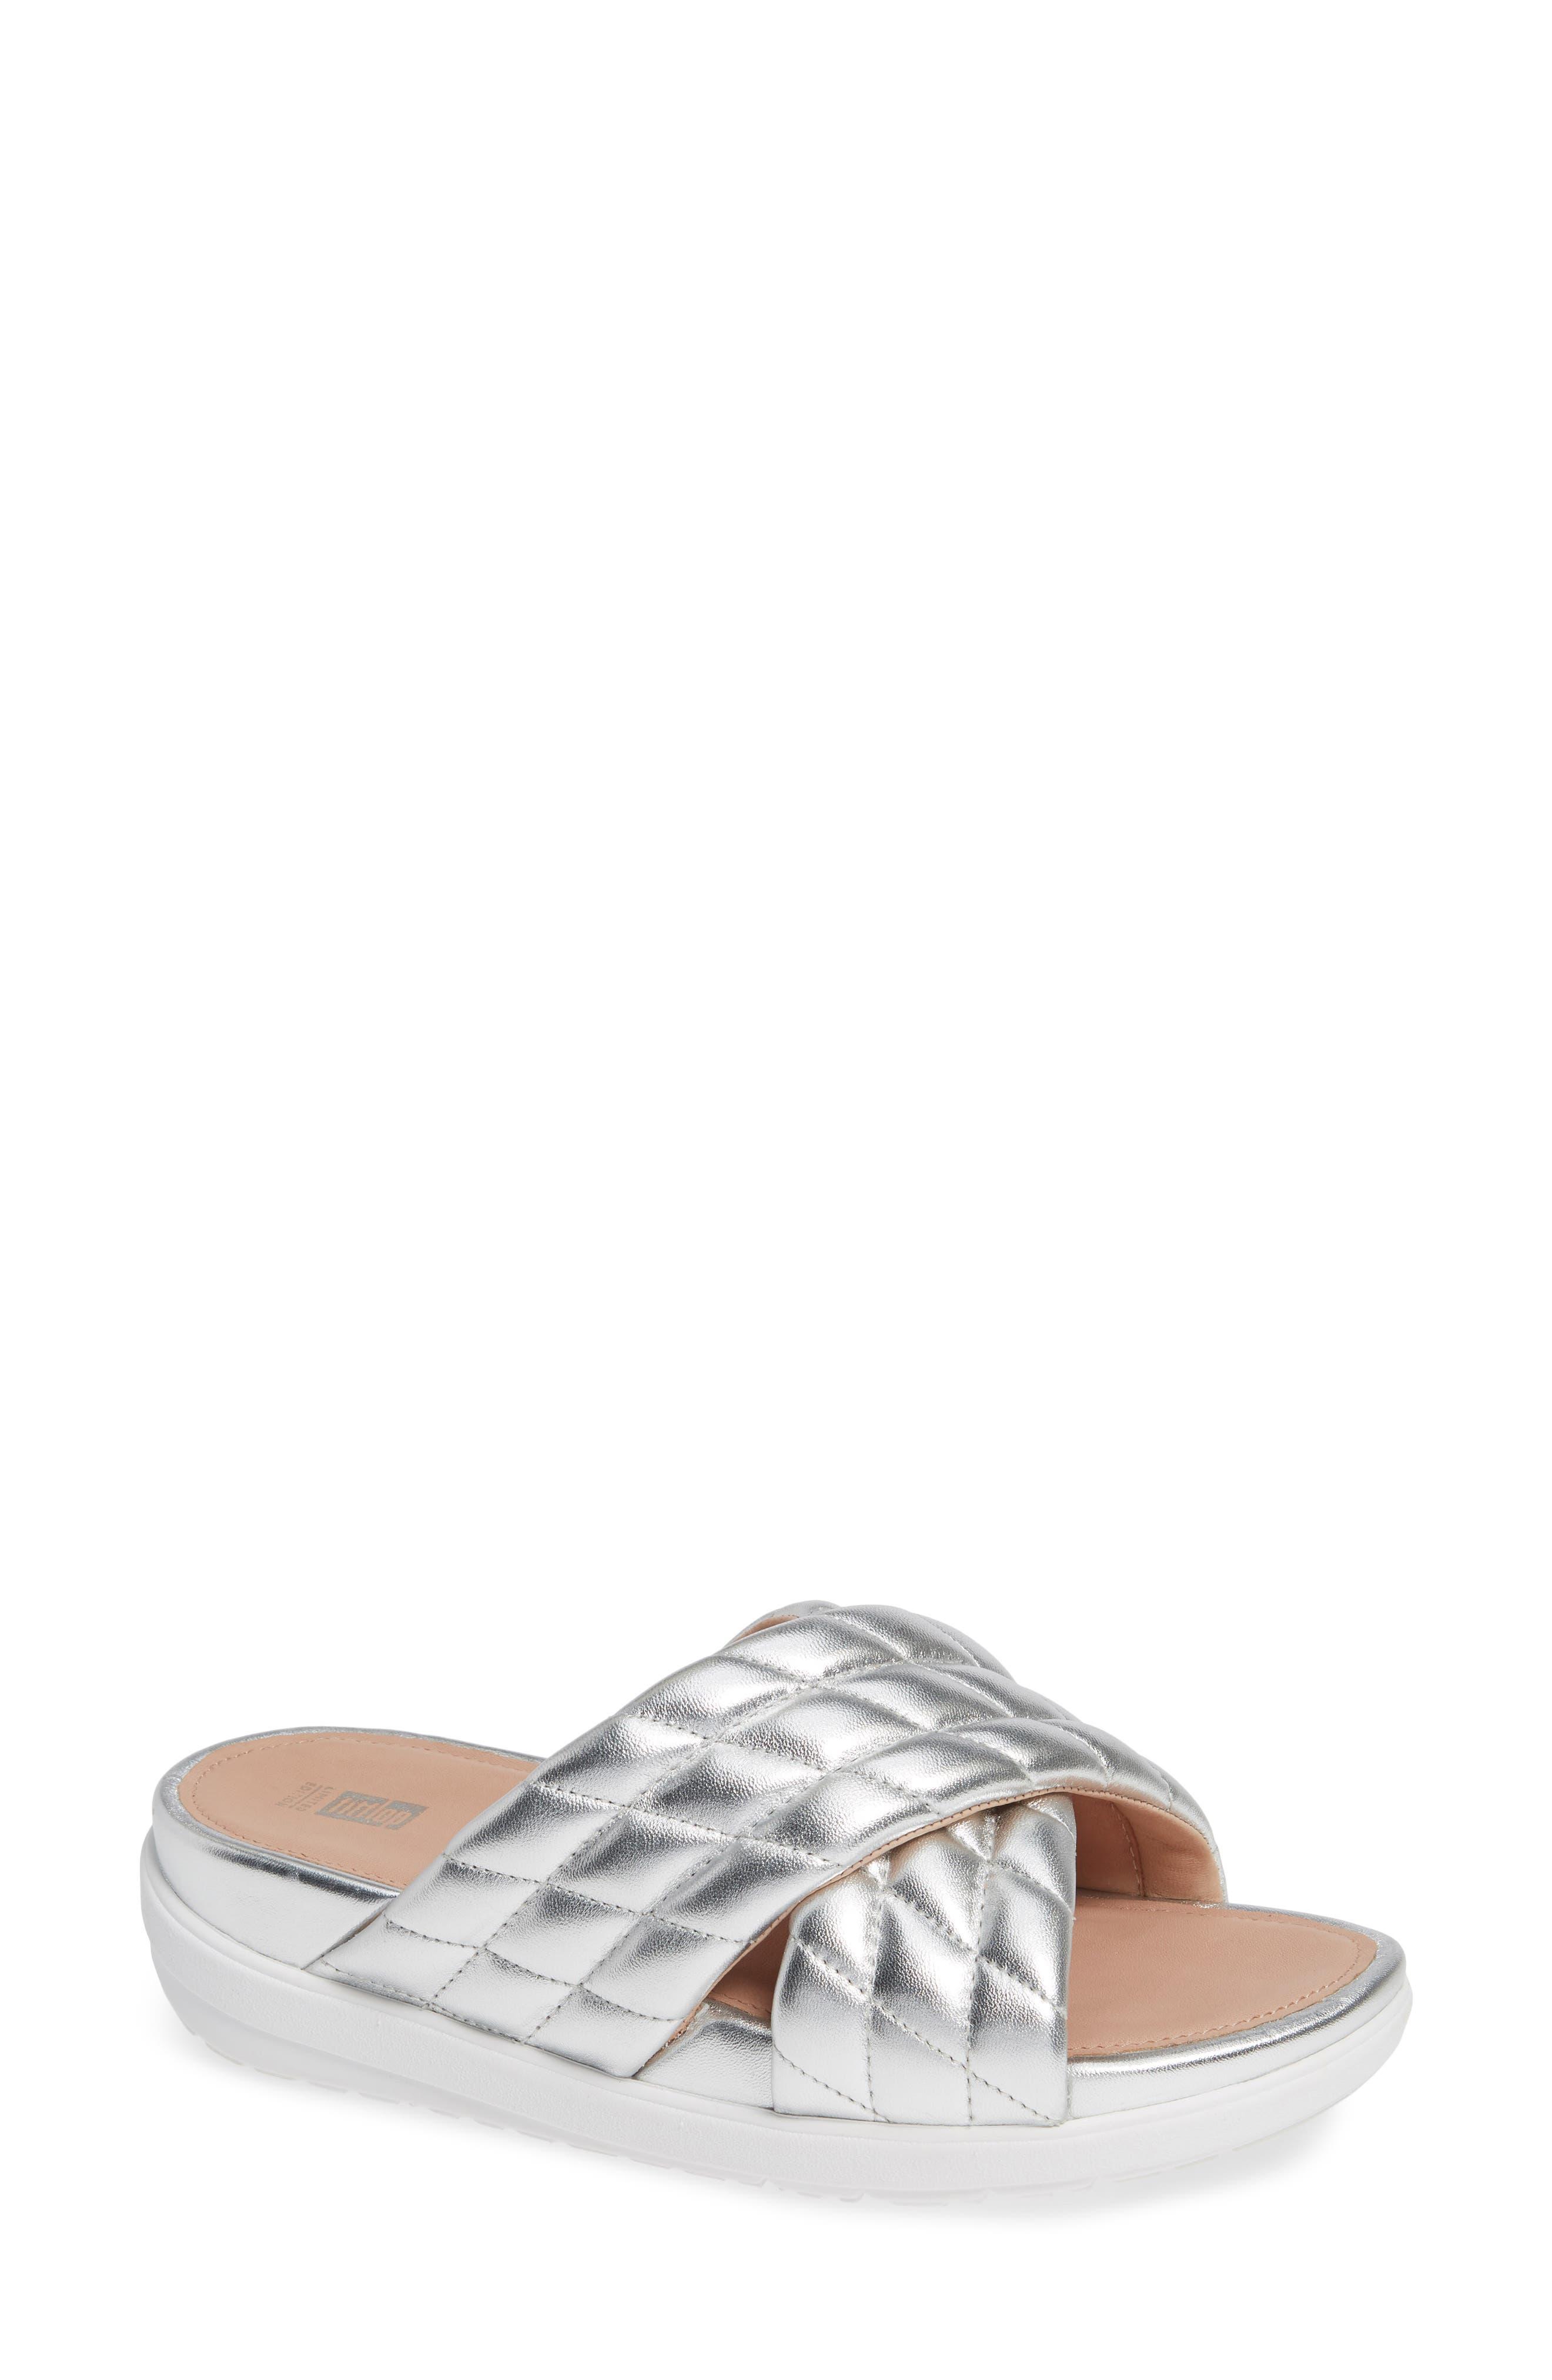 Fitflop Loosh Luxe Slide Sandal, Metallic